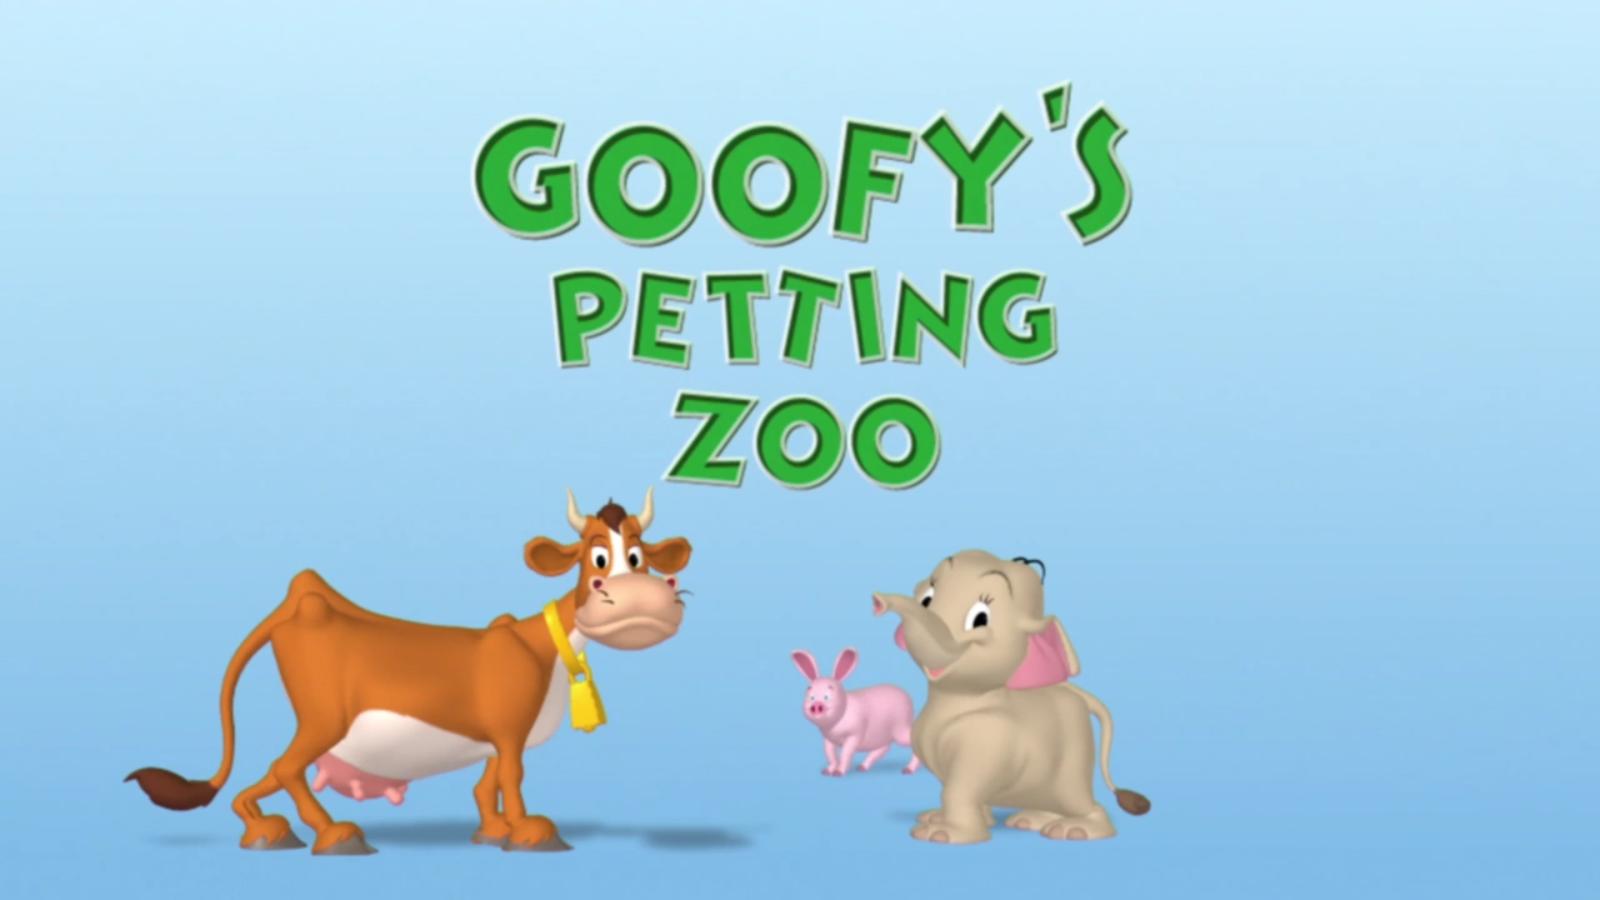 Goofy's Petting Zoo